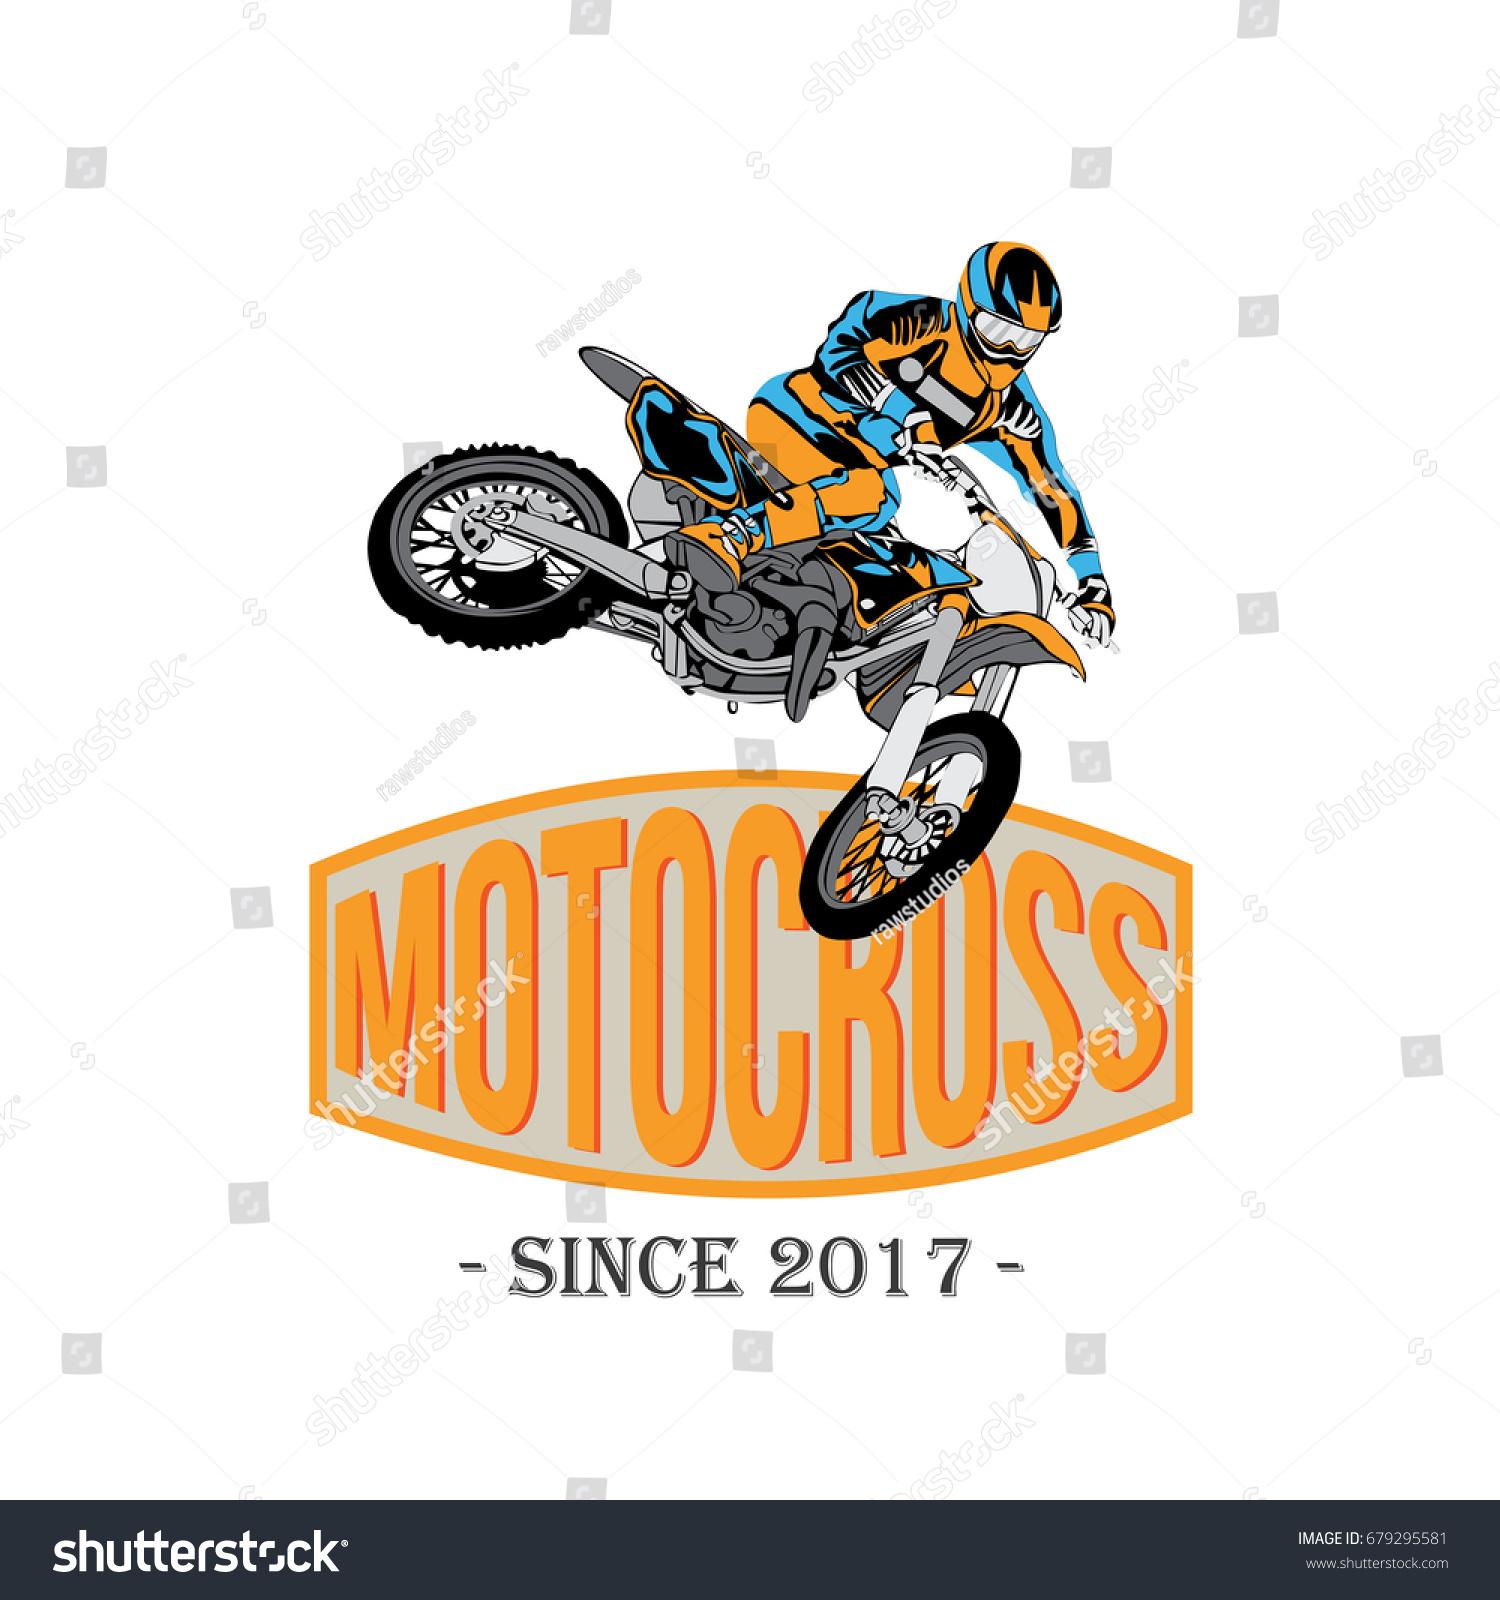 Vintage Motocross Rider Badge Logo Design Stock Vector Royalty Free 679295581